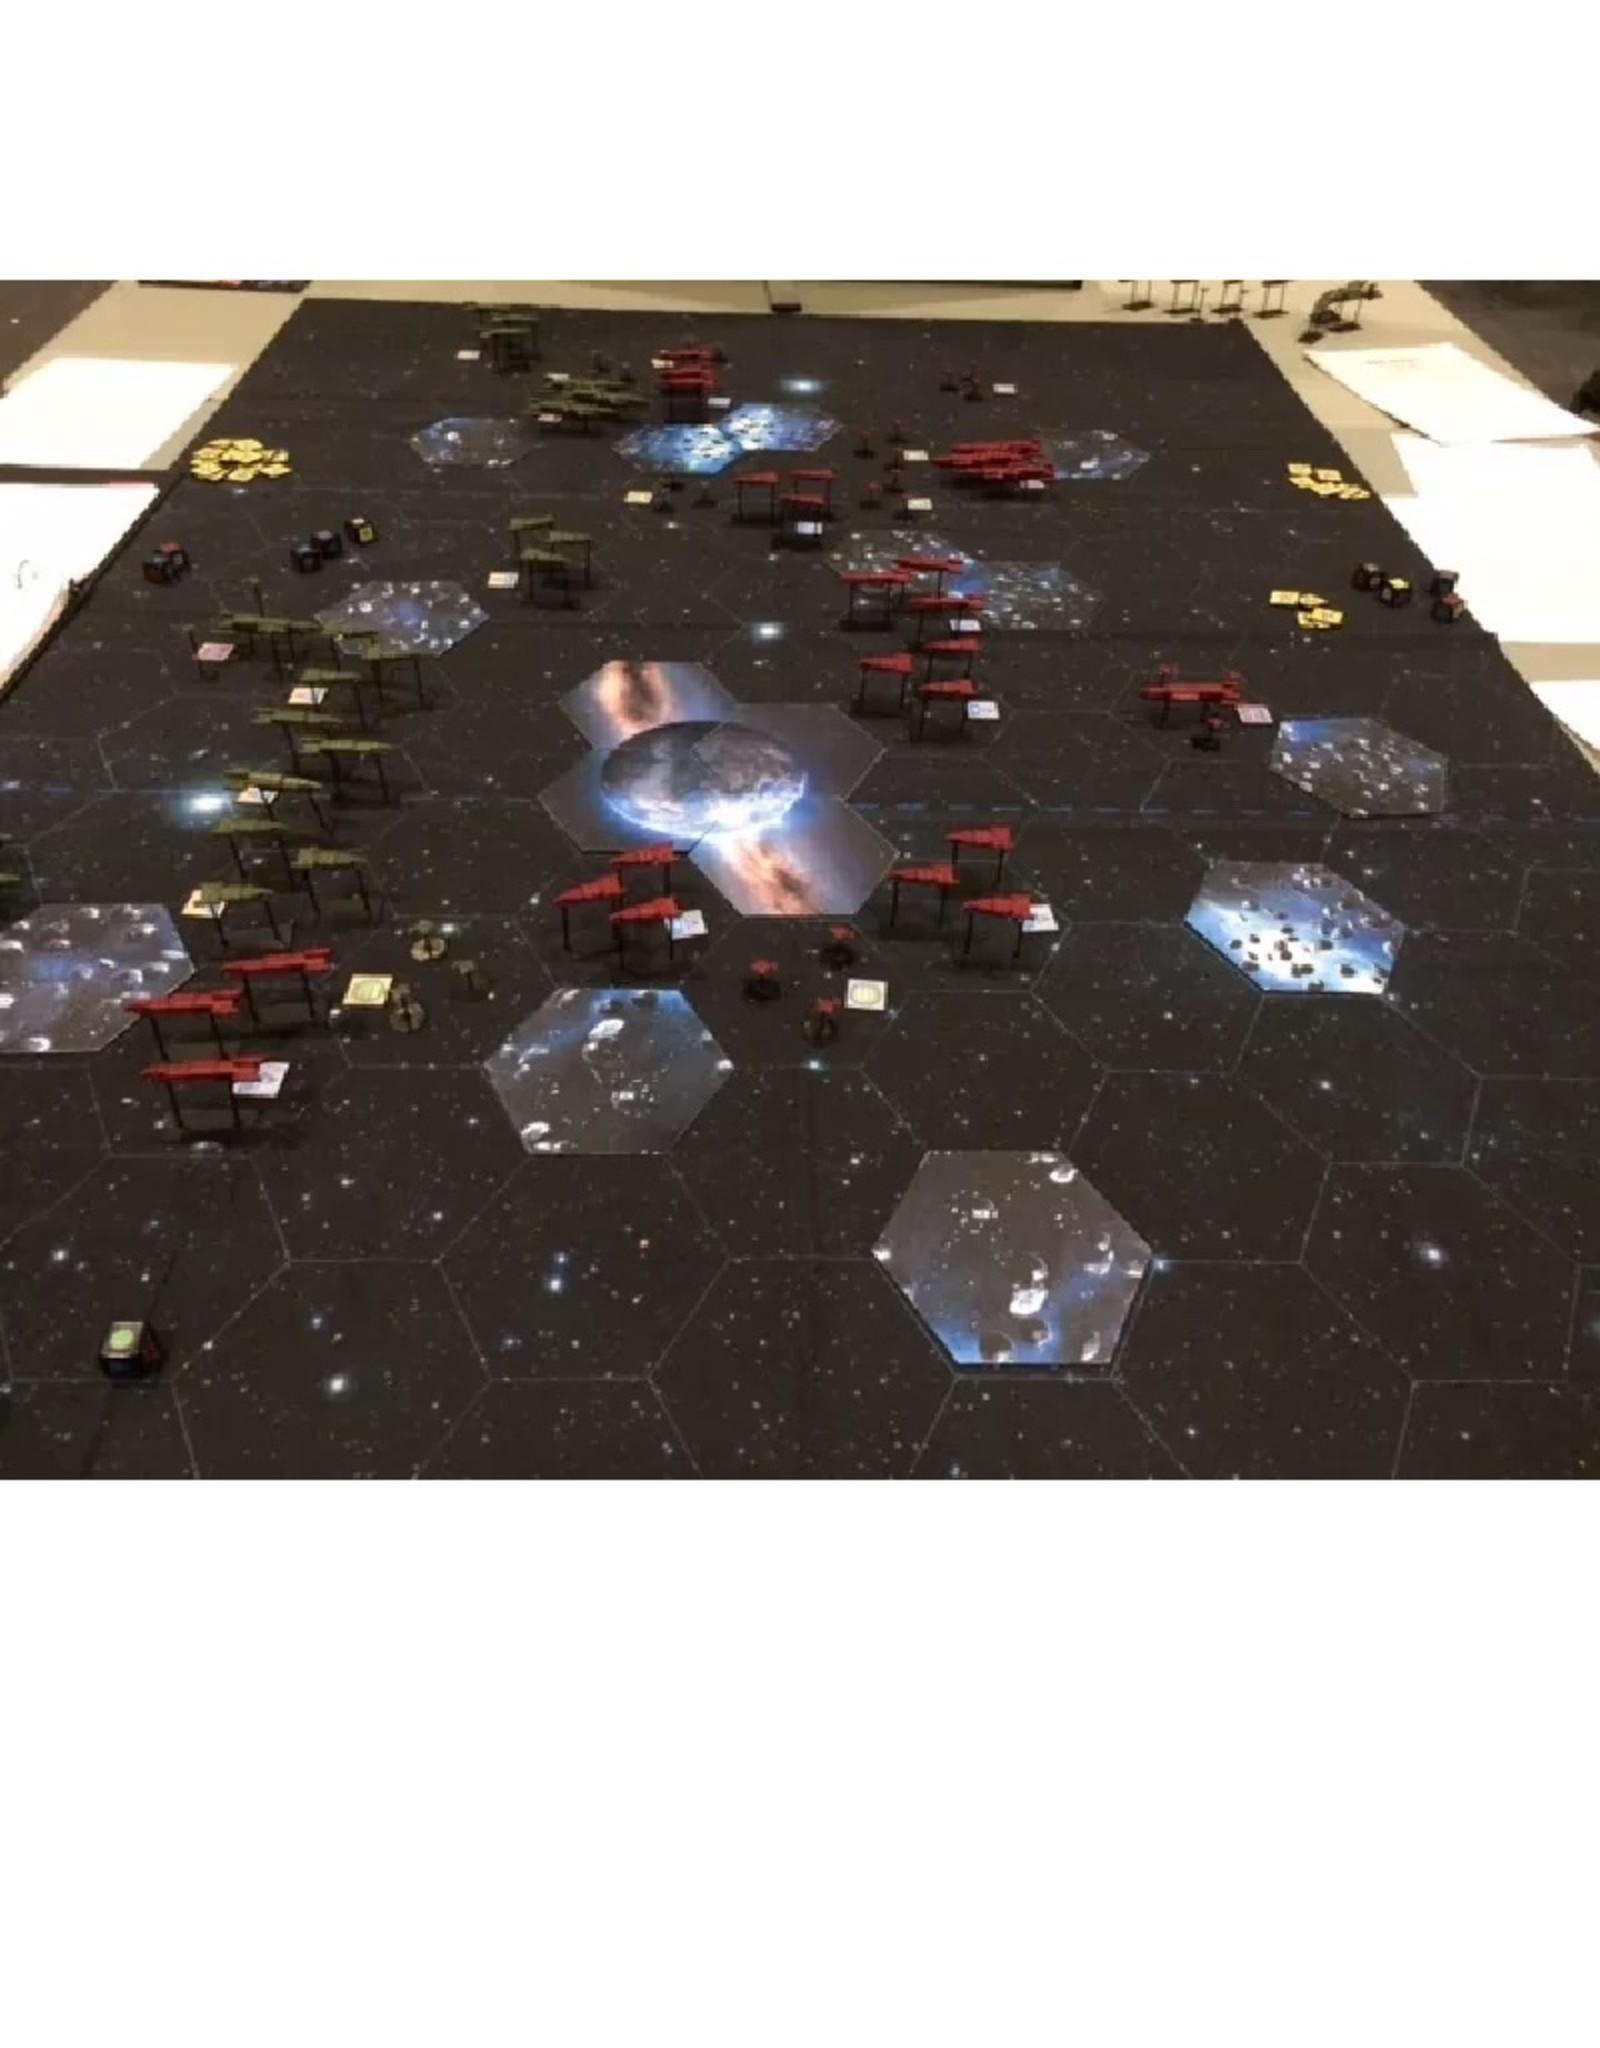 Plastic Soldier Company Red Alert Boardgame